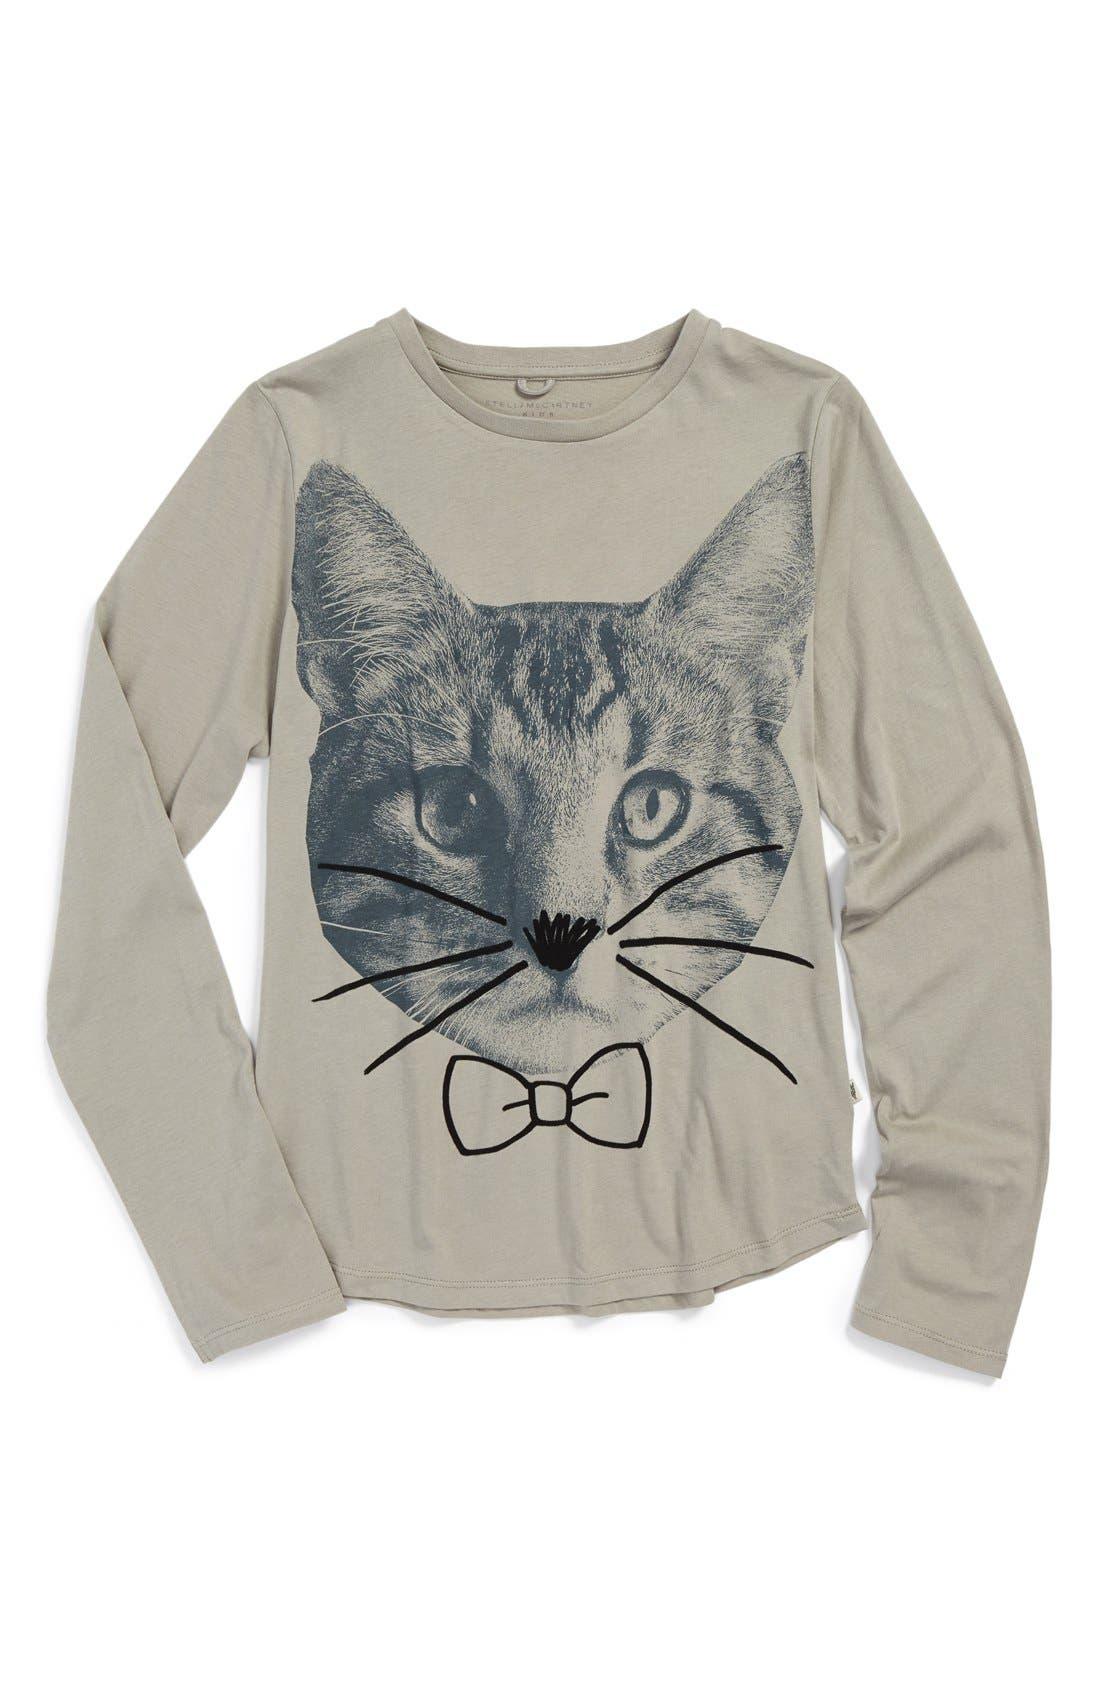 Alternate Image 1 Selected - Stella McCartney Kids 'Cat' Long Sleeve Tee (Toddler Girls, Little Girls & Big Girls)